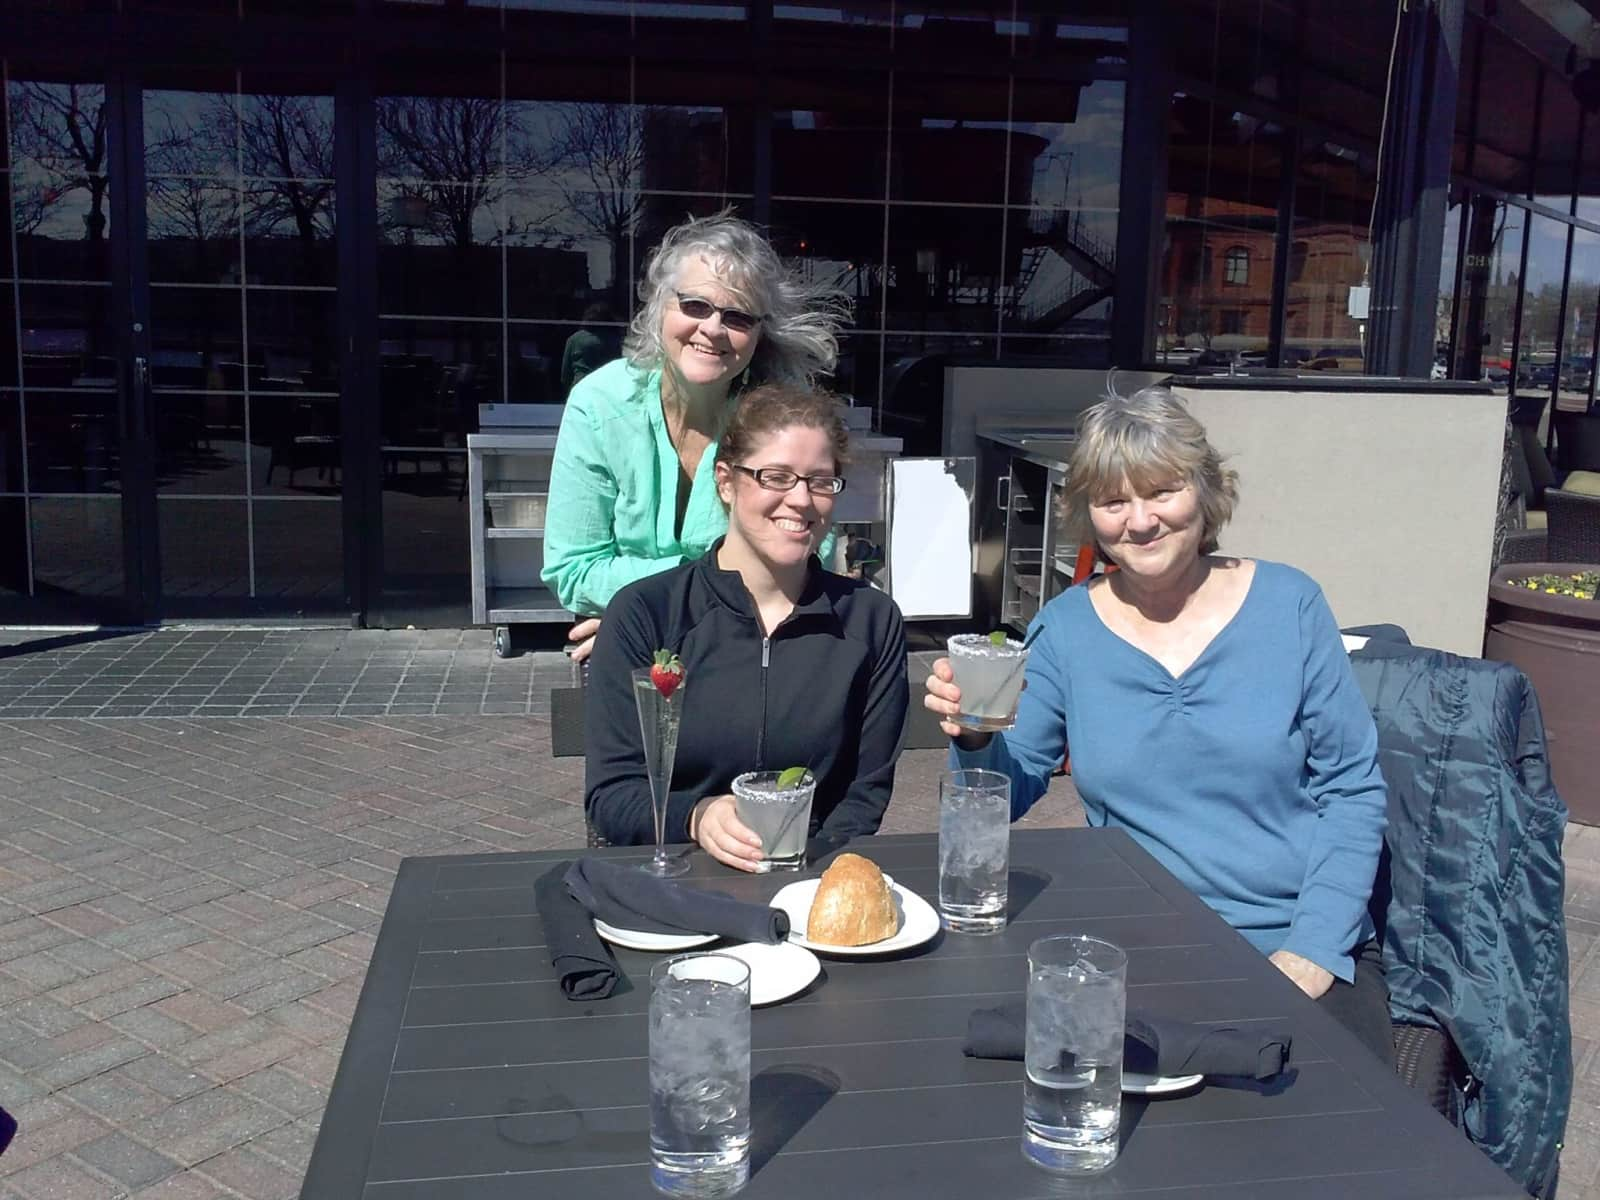 Mary & Barbara (sister) from Denver, Colorado, United States